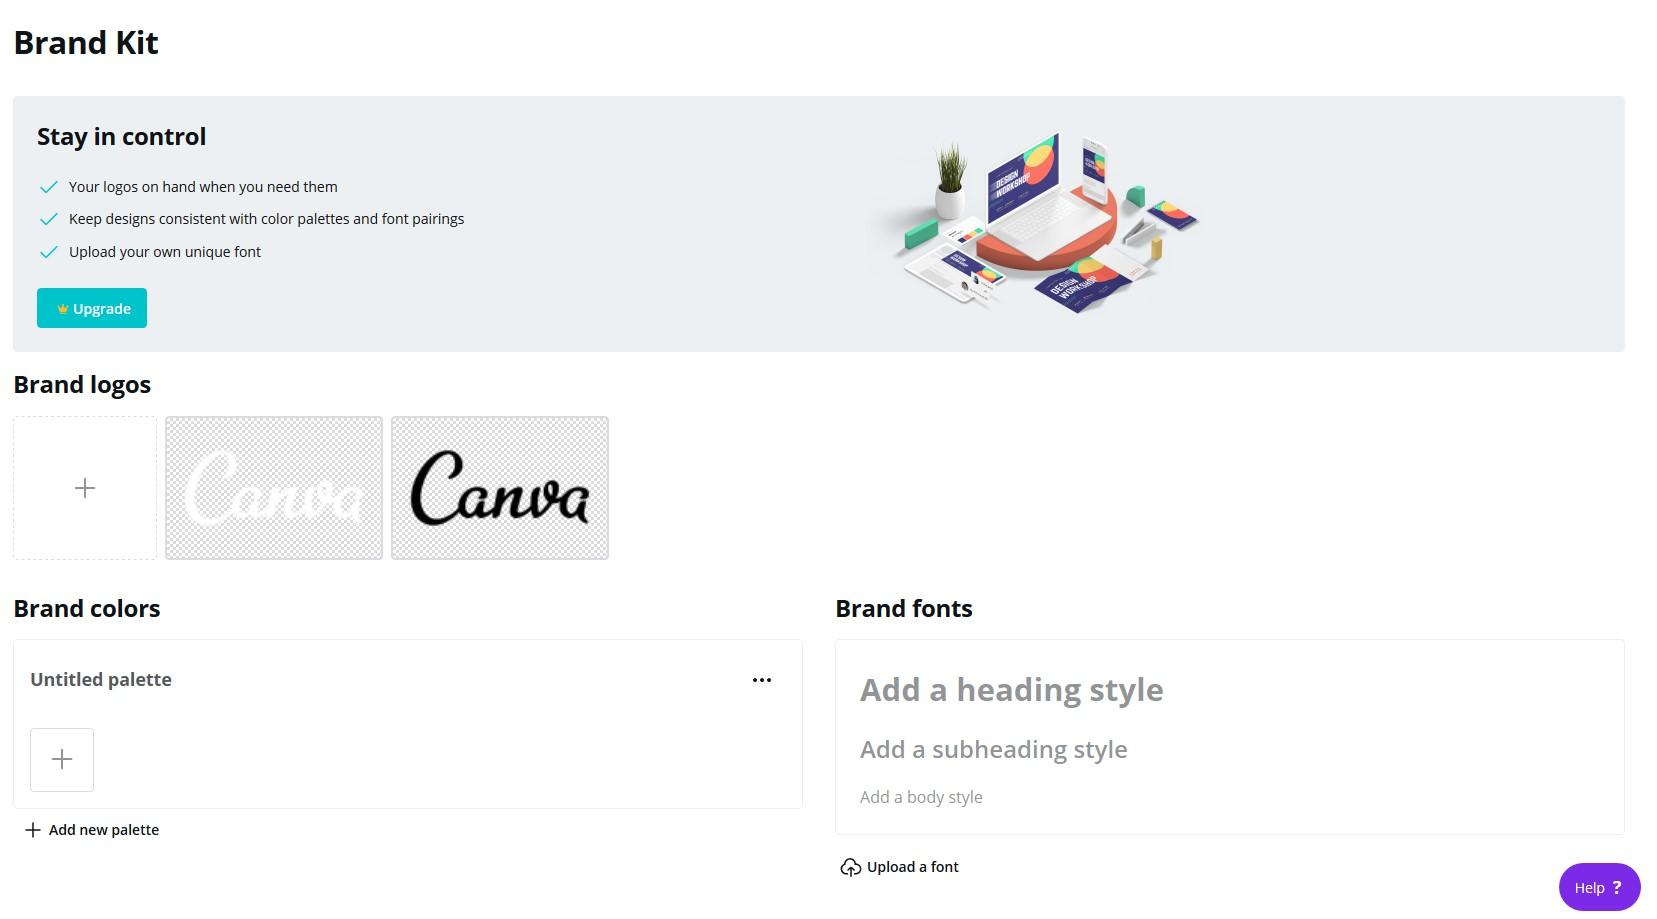 canva pro brand kit manager